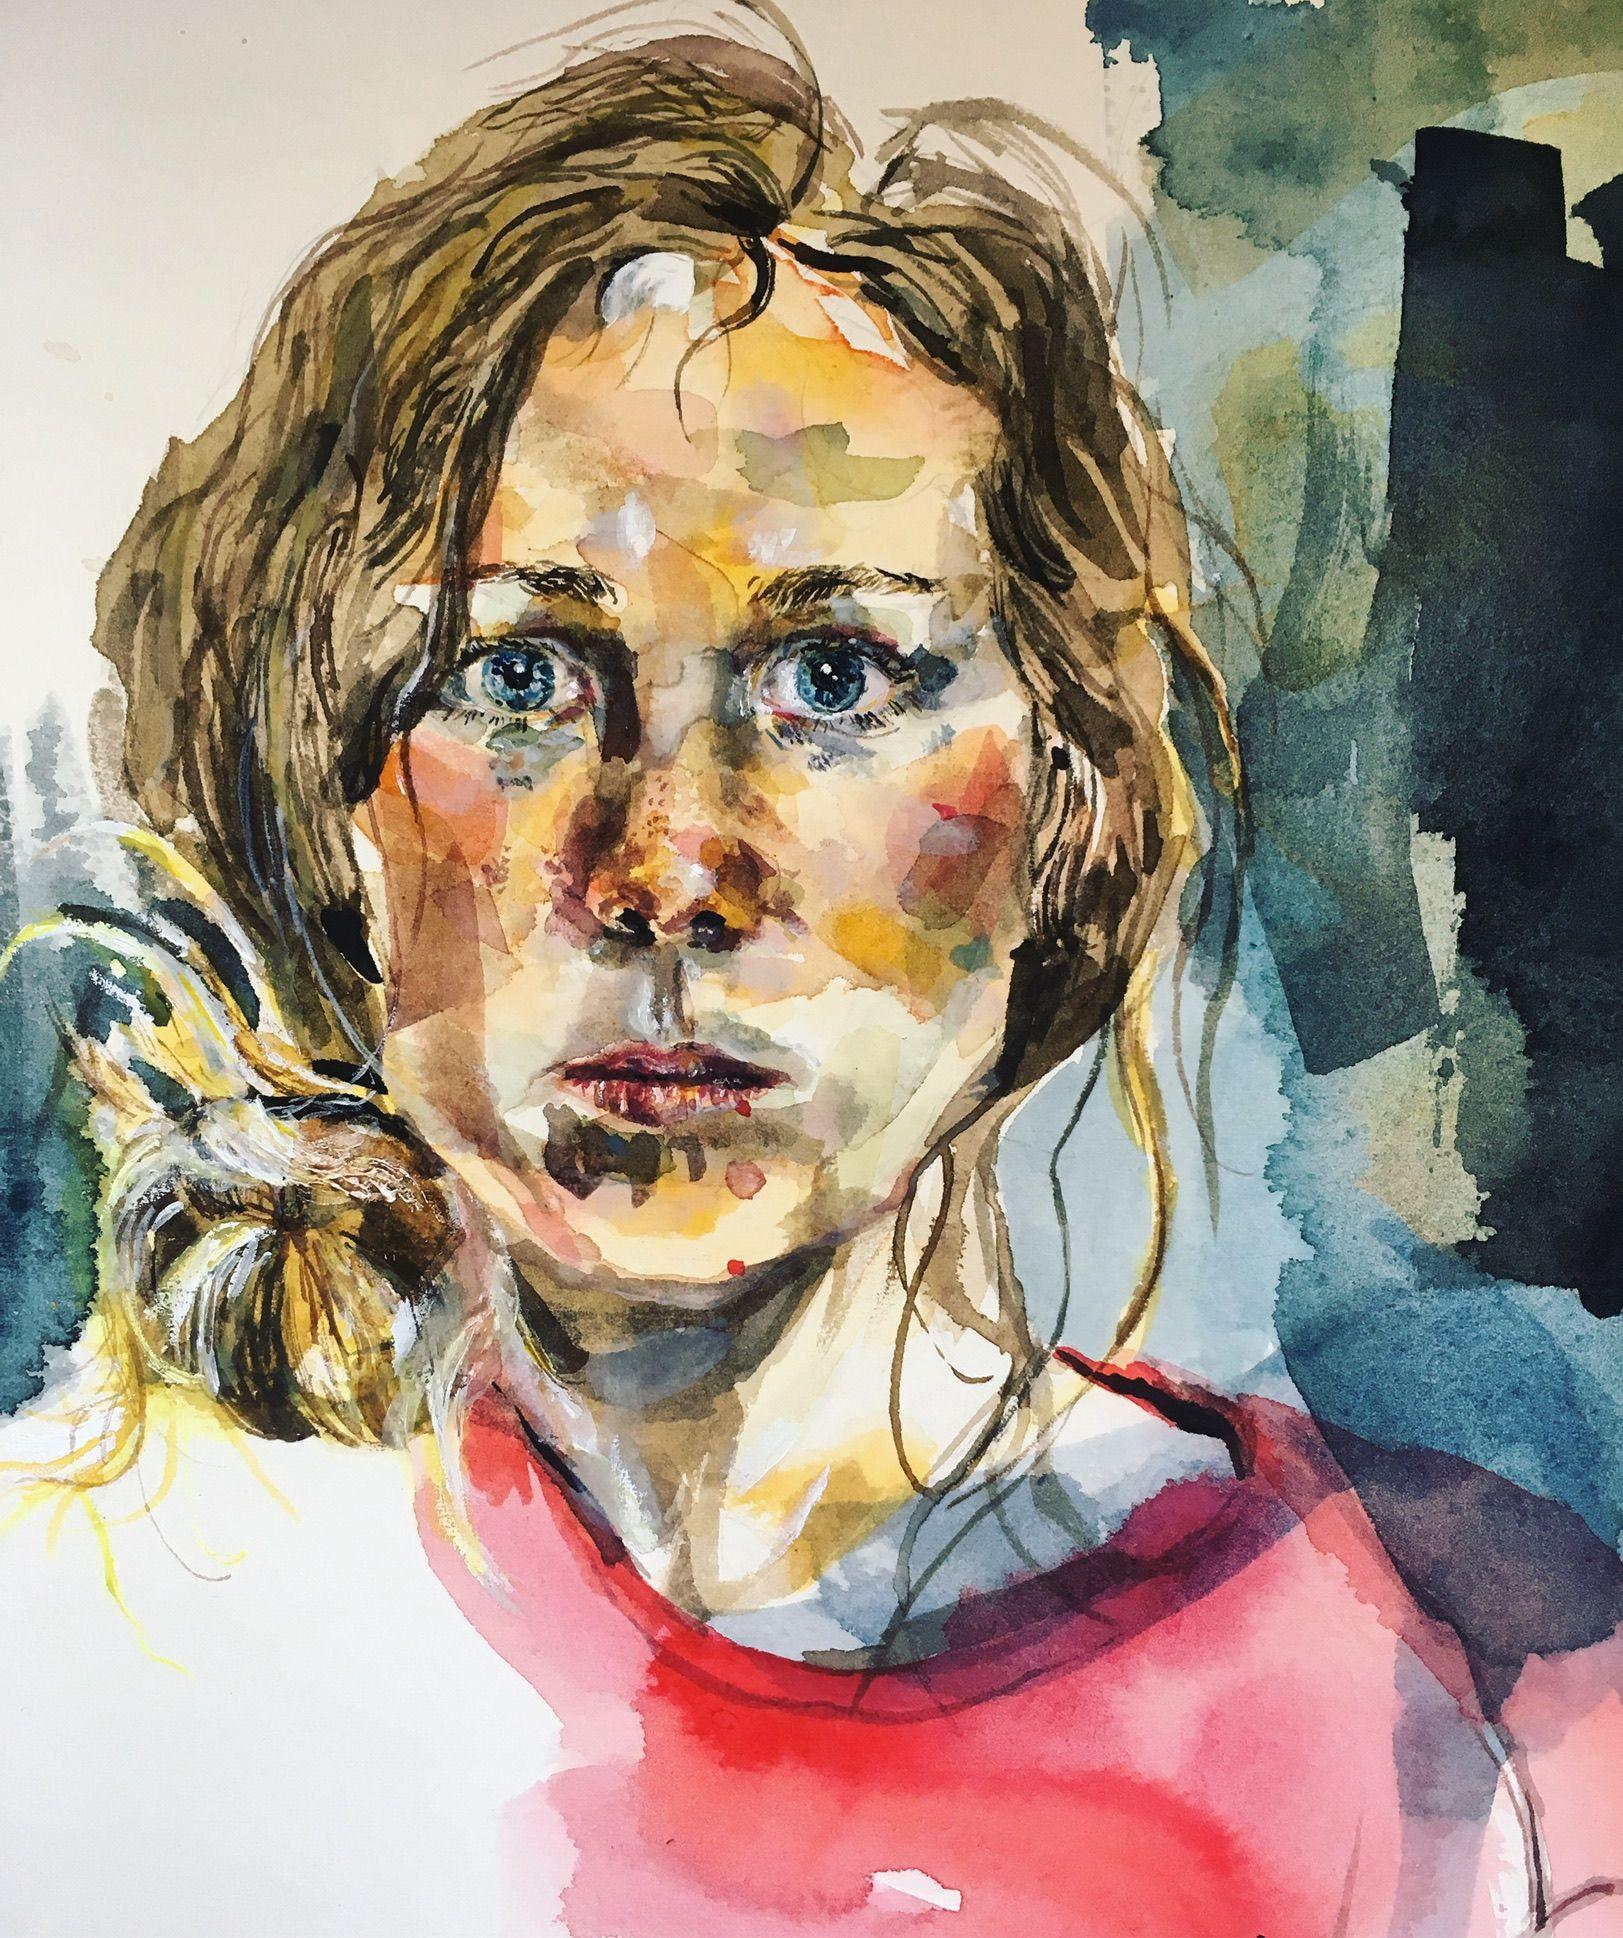 Self Portrait Entry For Sky Arts Portrait Artist Of Year 2017 Fingers Crossed For Other Works See My Website Susannadavies Co Artist Portrait Artist Sky Art